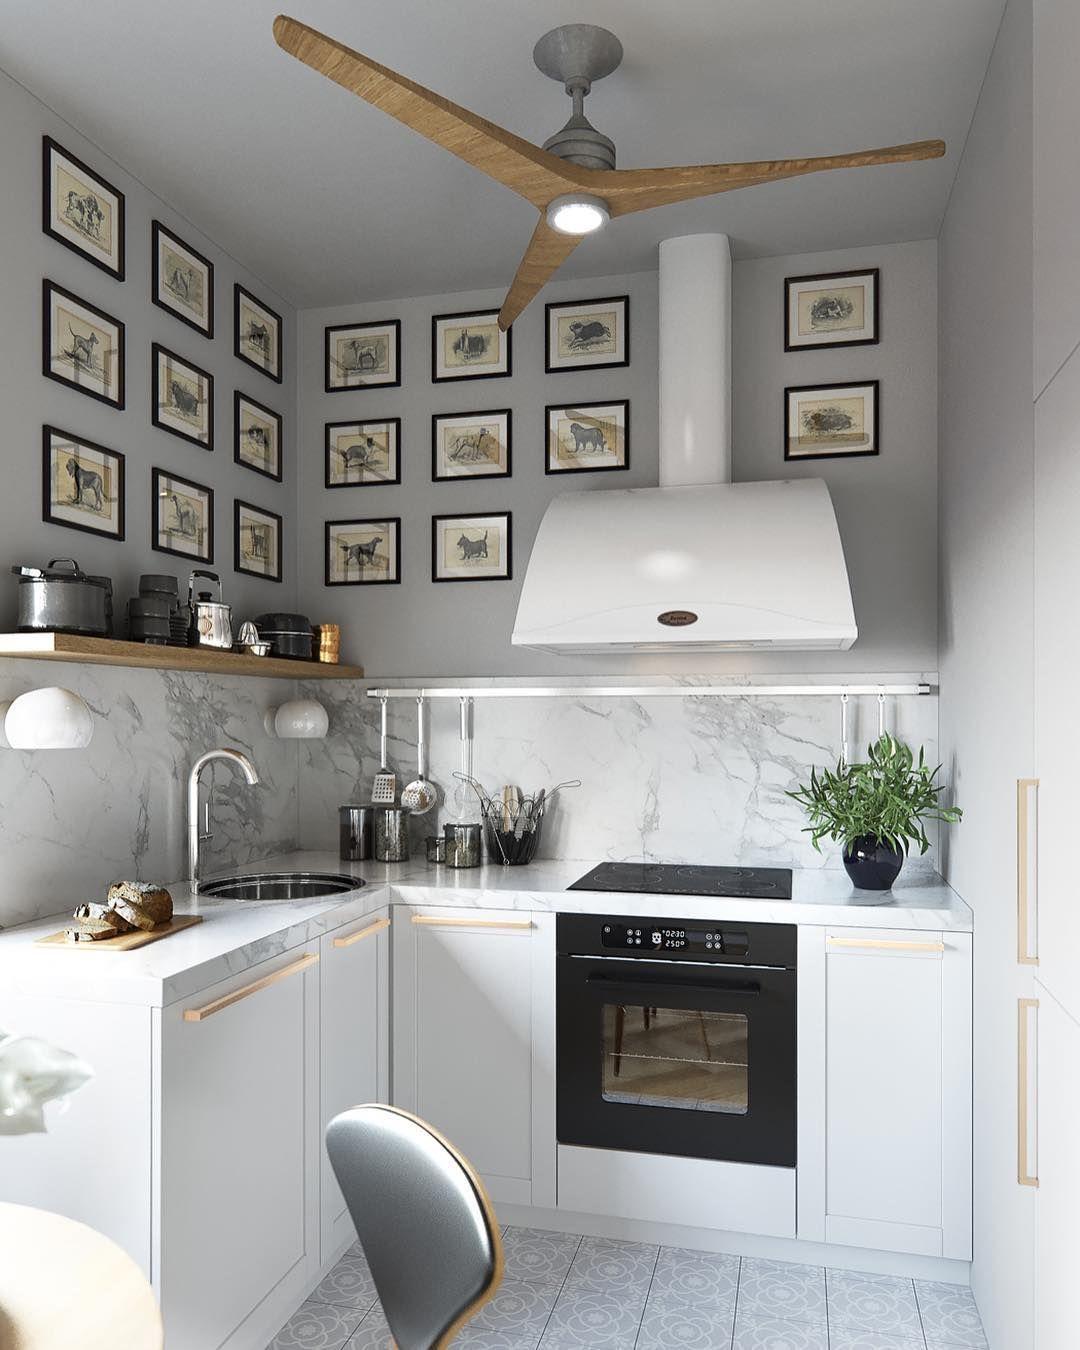 Картинки по запросу кухня без верхних шкафов фото ...